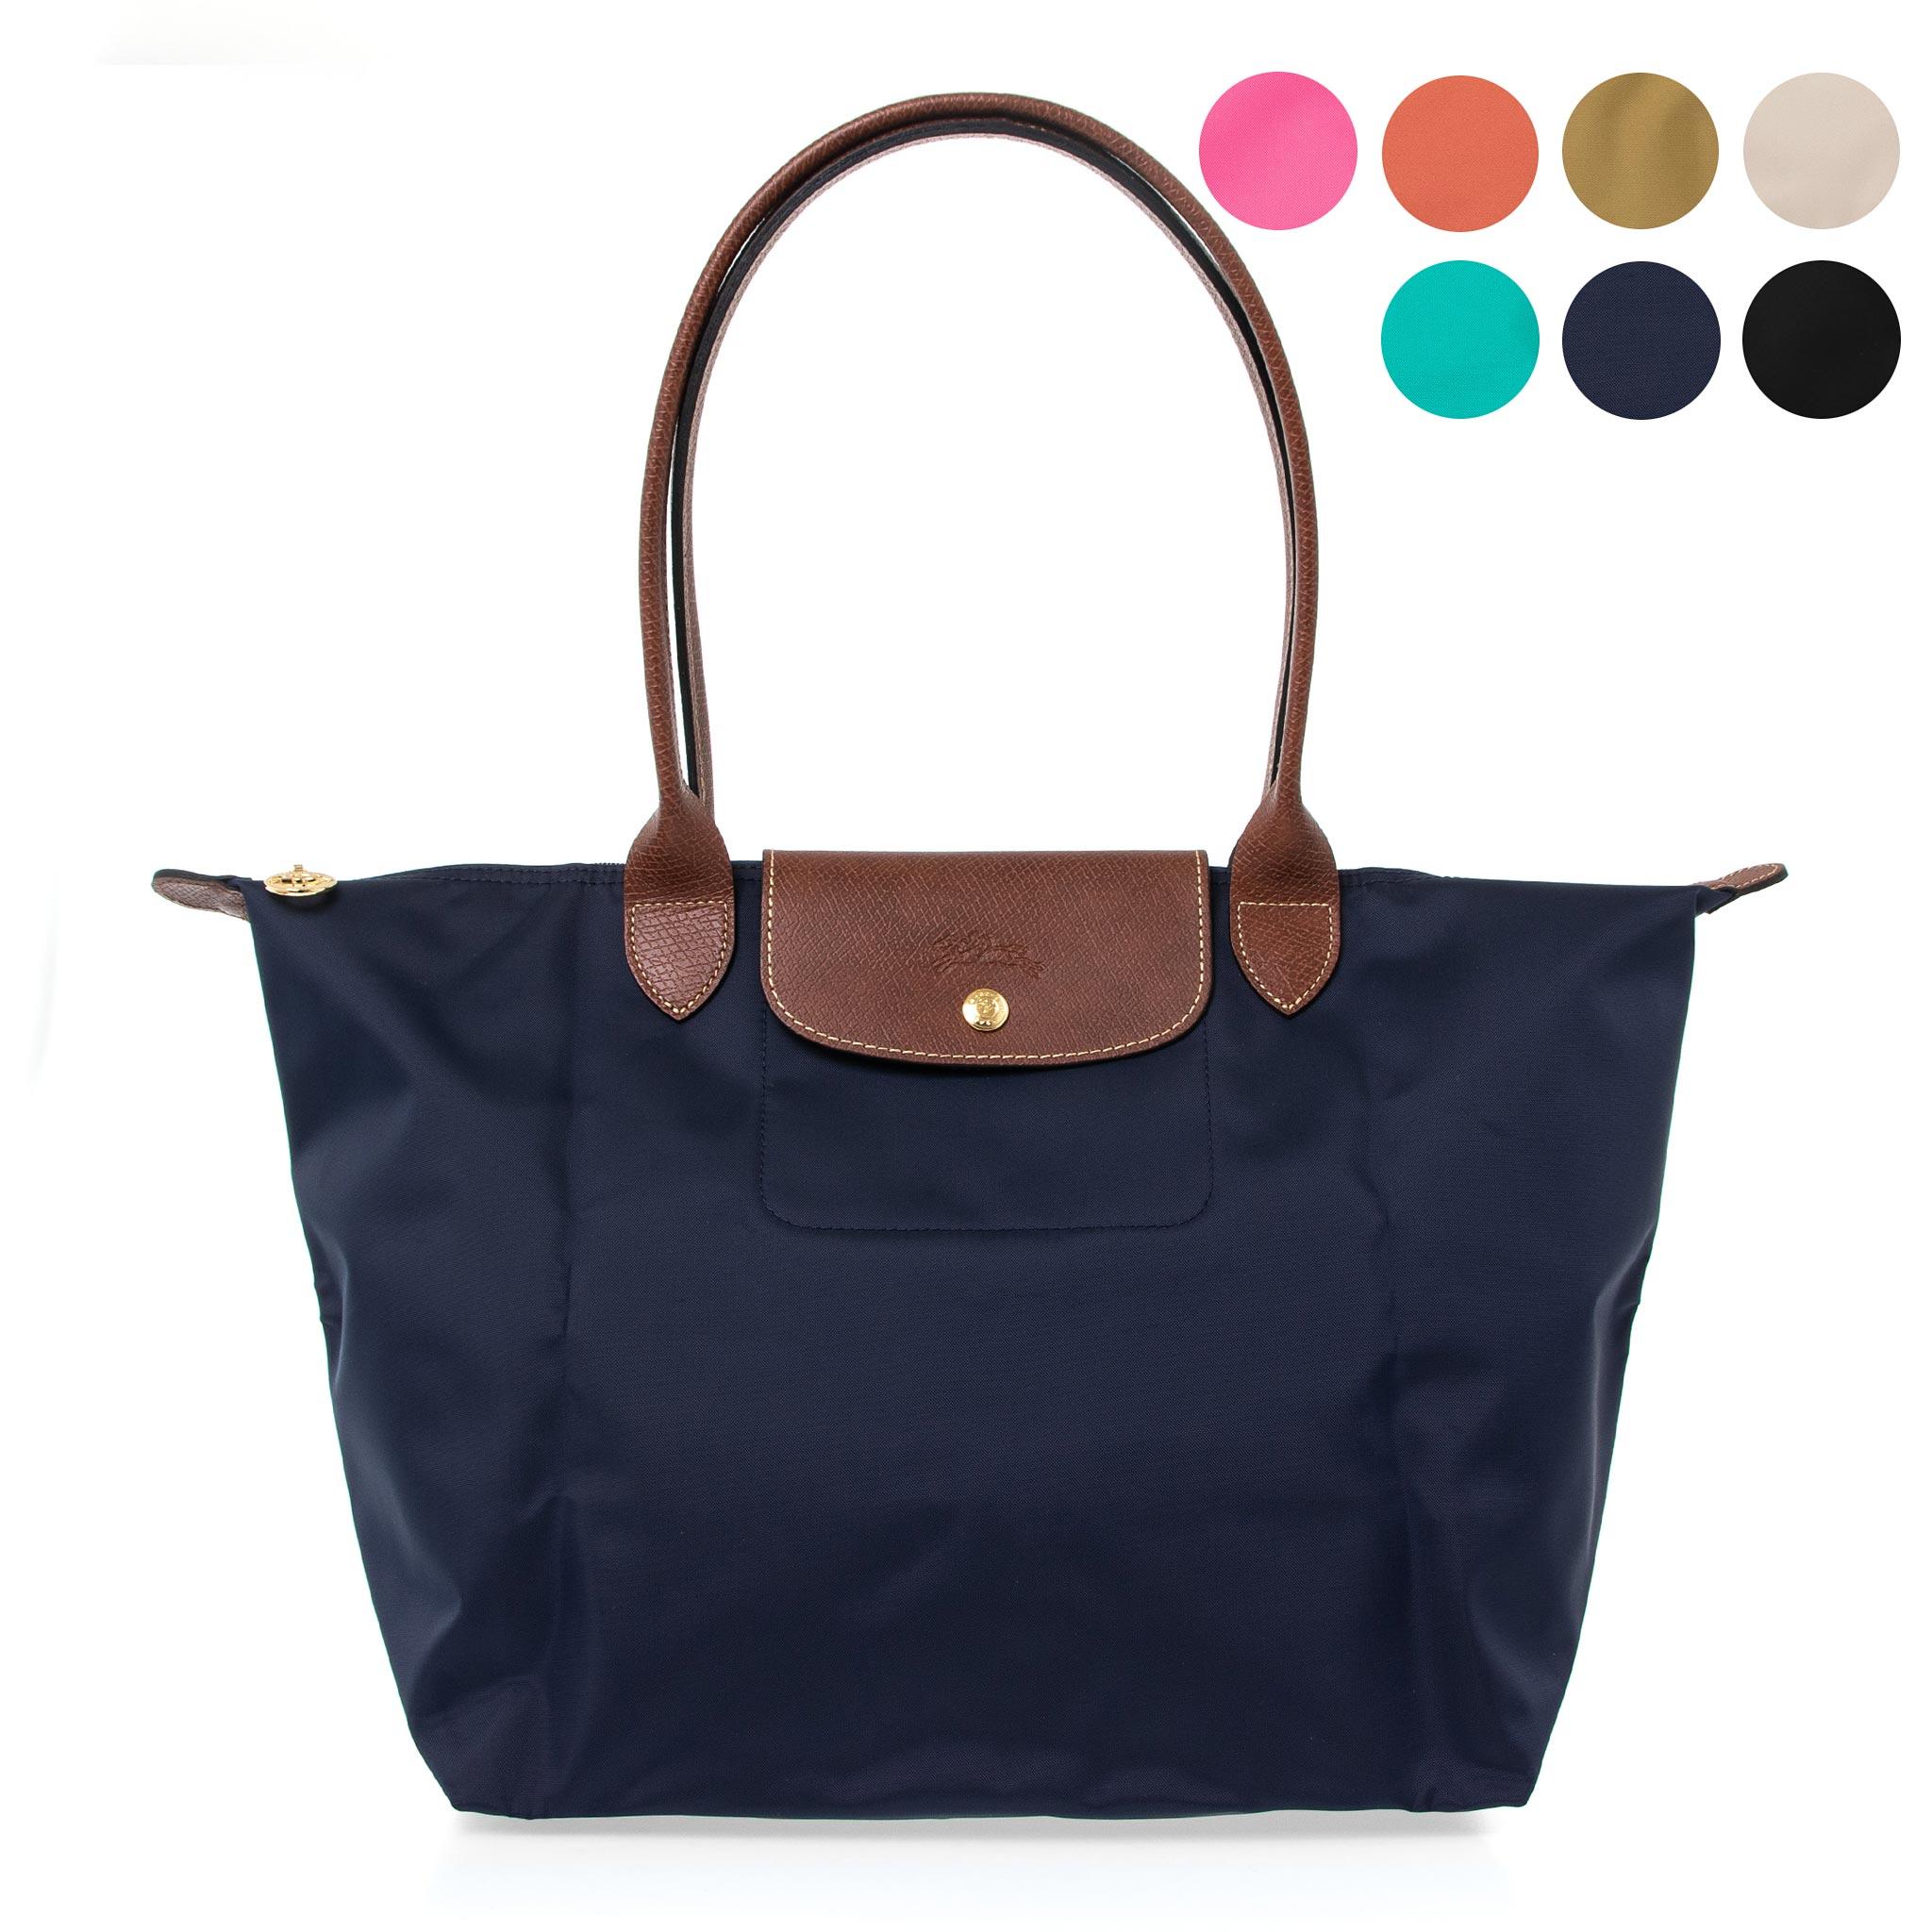 02ed623a80 Longchamp tote bags LE PLIAGE [Le pliage, 1899 089 all 13 color LONGCHAMP  ...